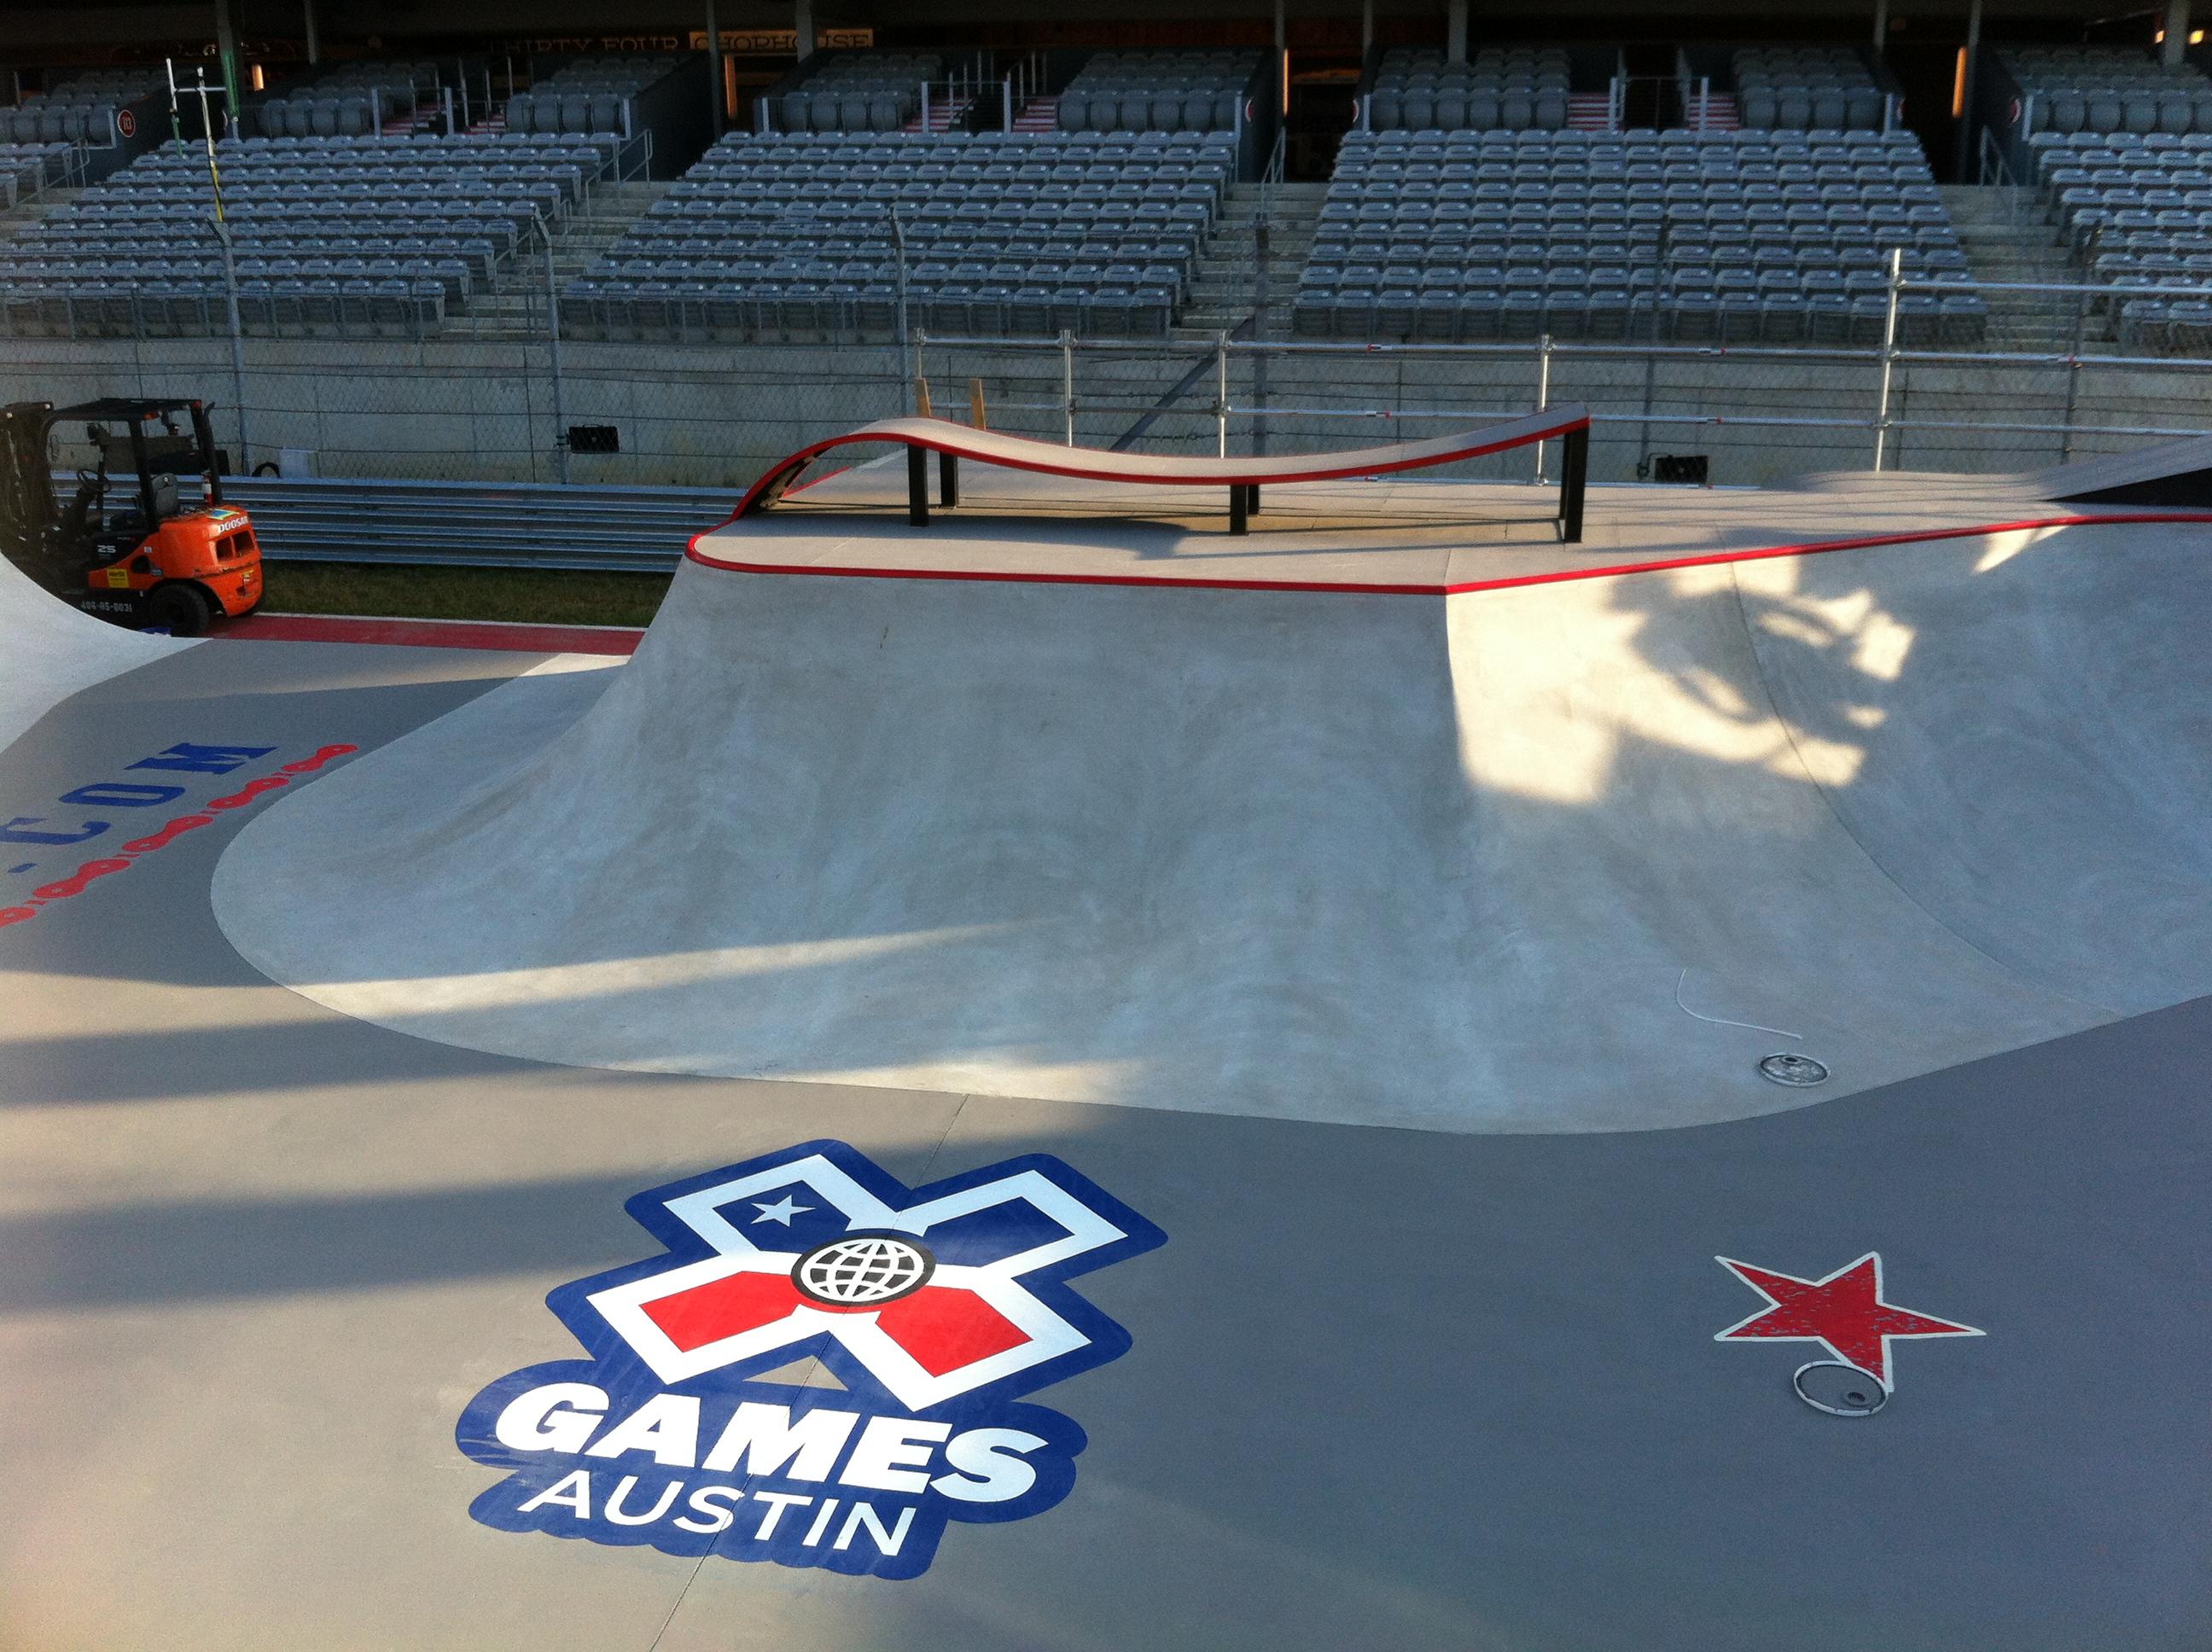 X Games Austin 2016